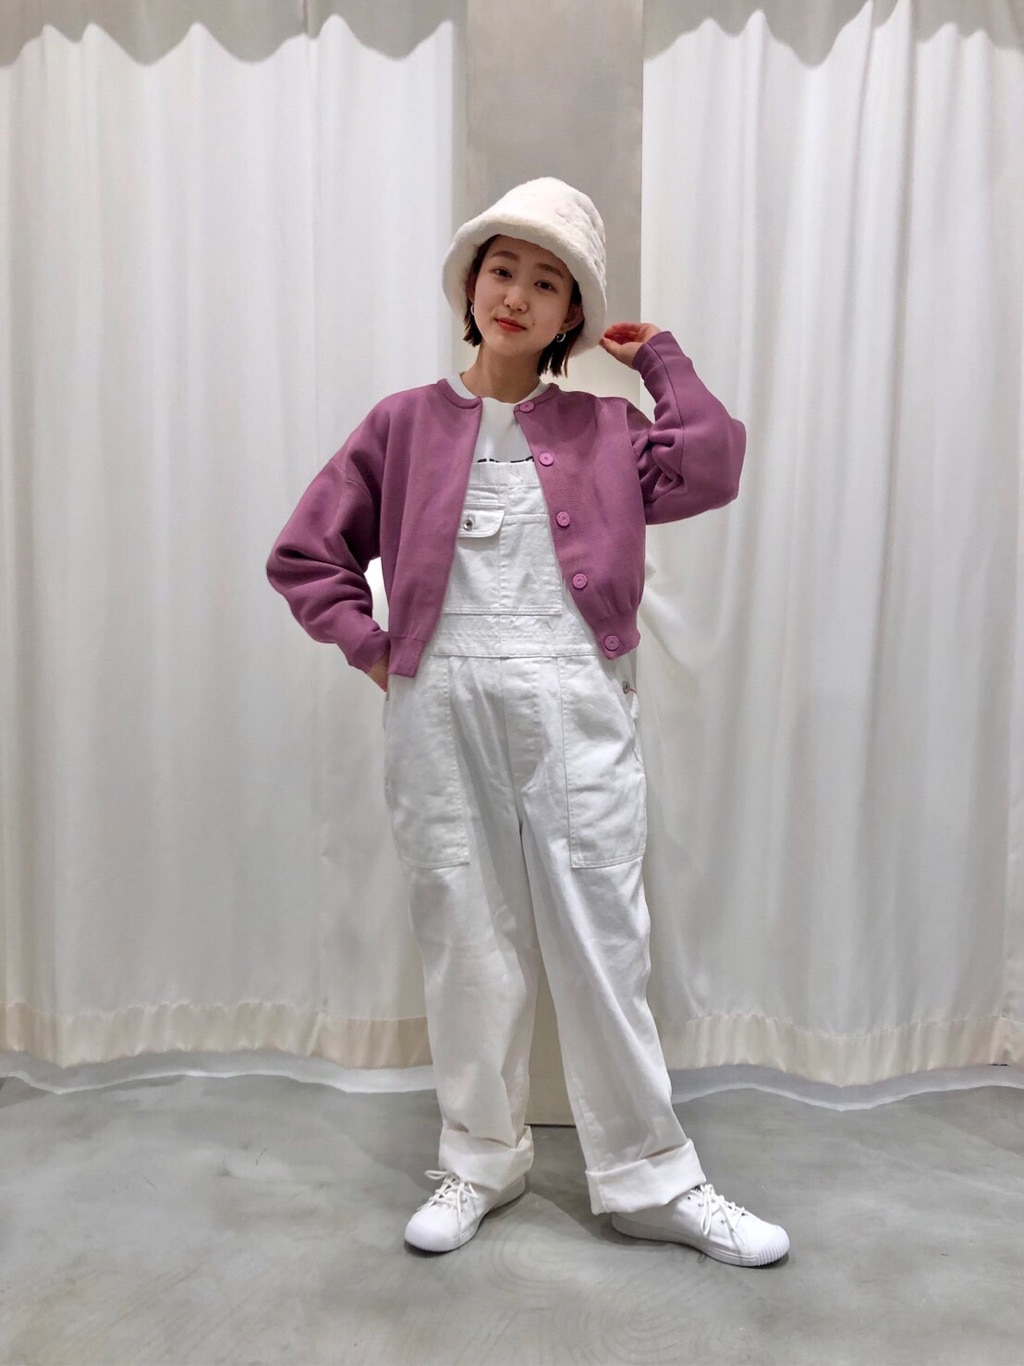 CHILD WOMAN , PAR ICI 東京スカイツリータウン・ソラマチ 2020.10.02